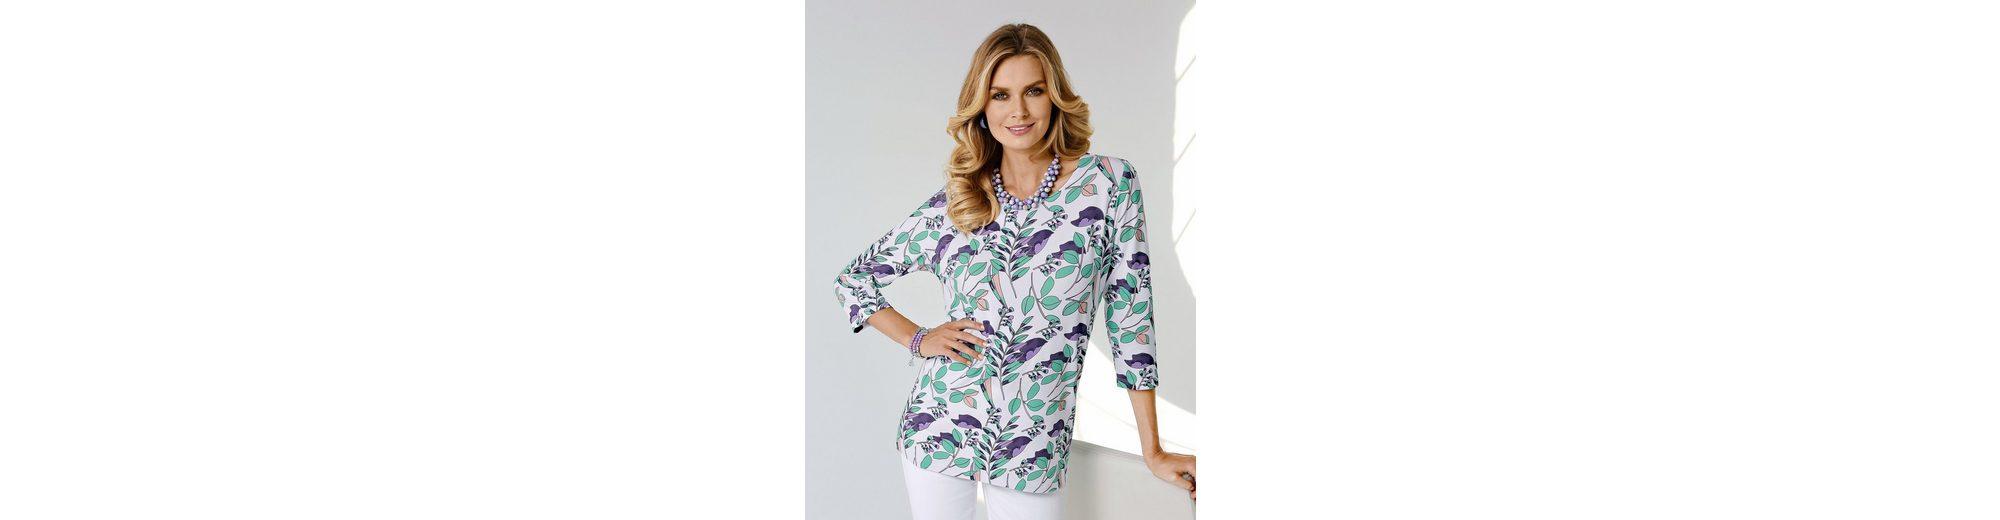 Paola Shirt mit Druck Verkauf Original aM0186xQS